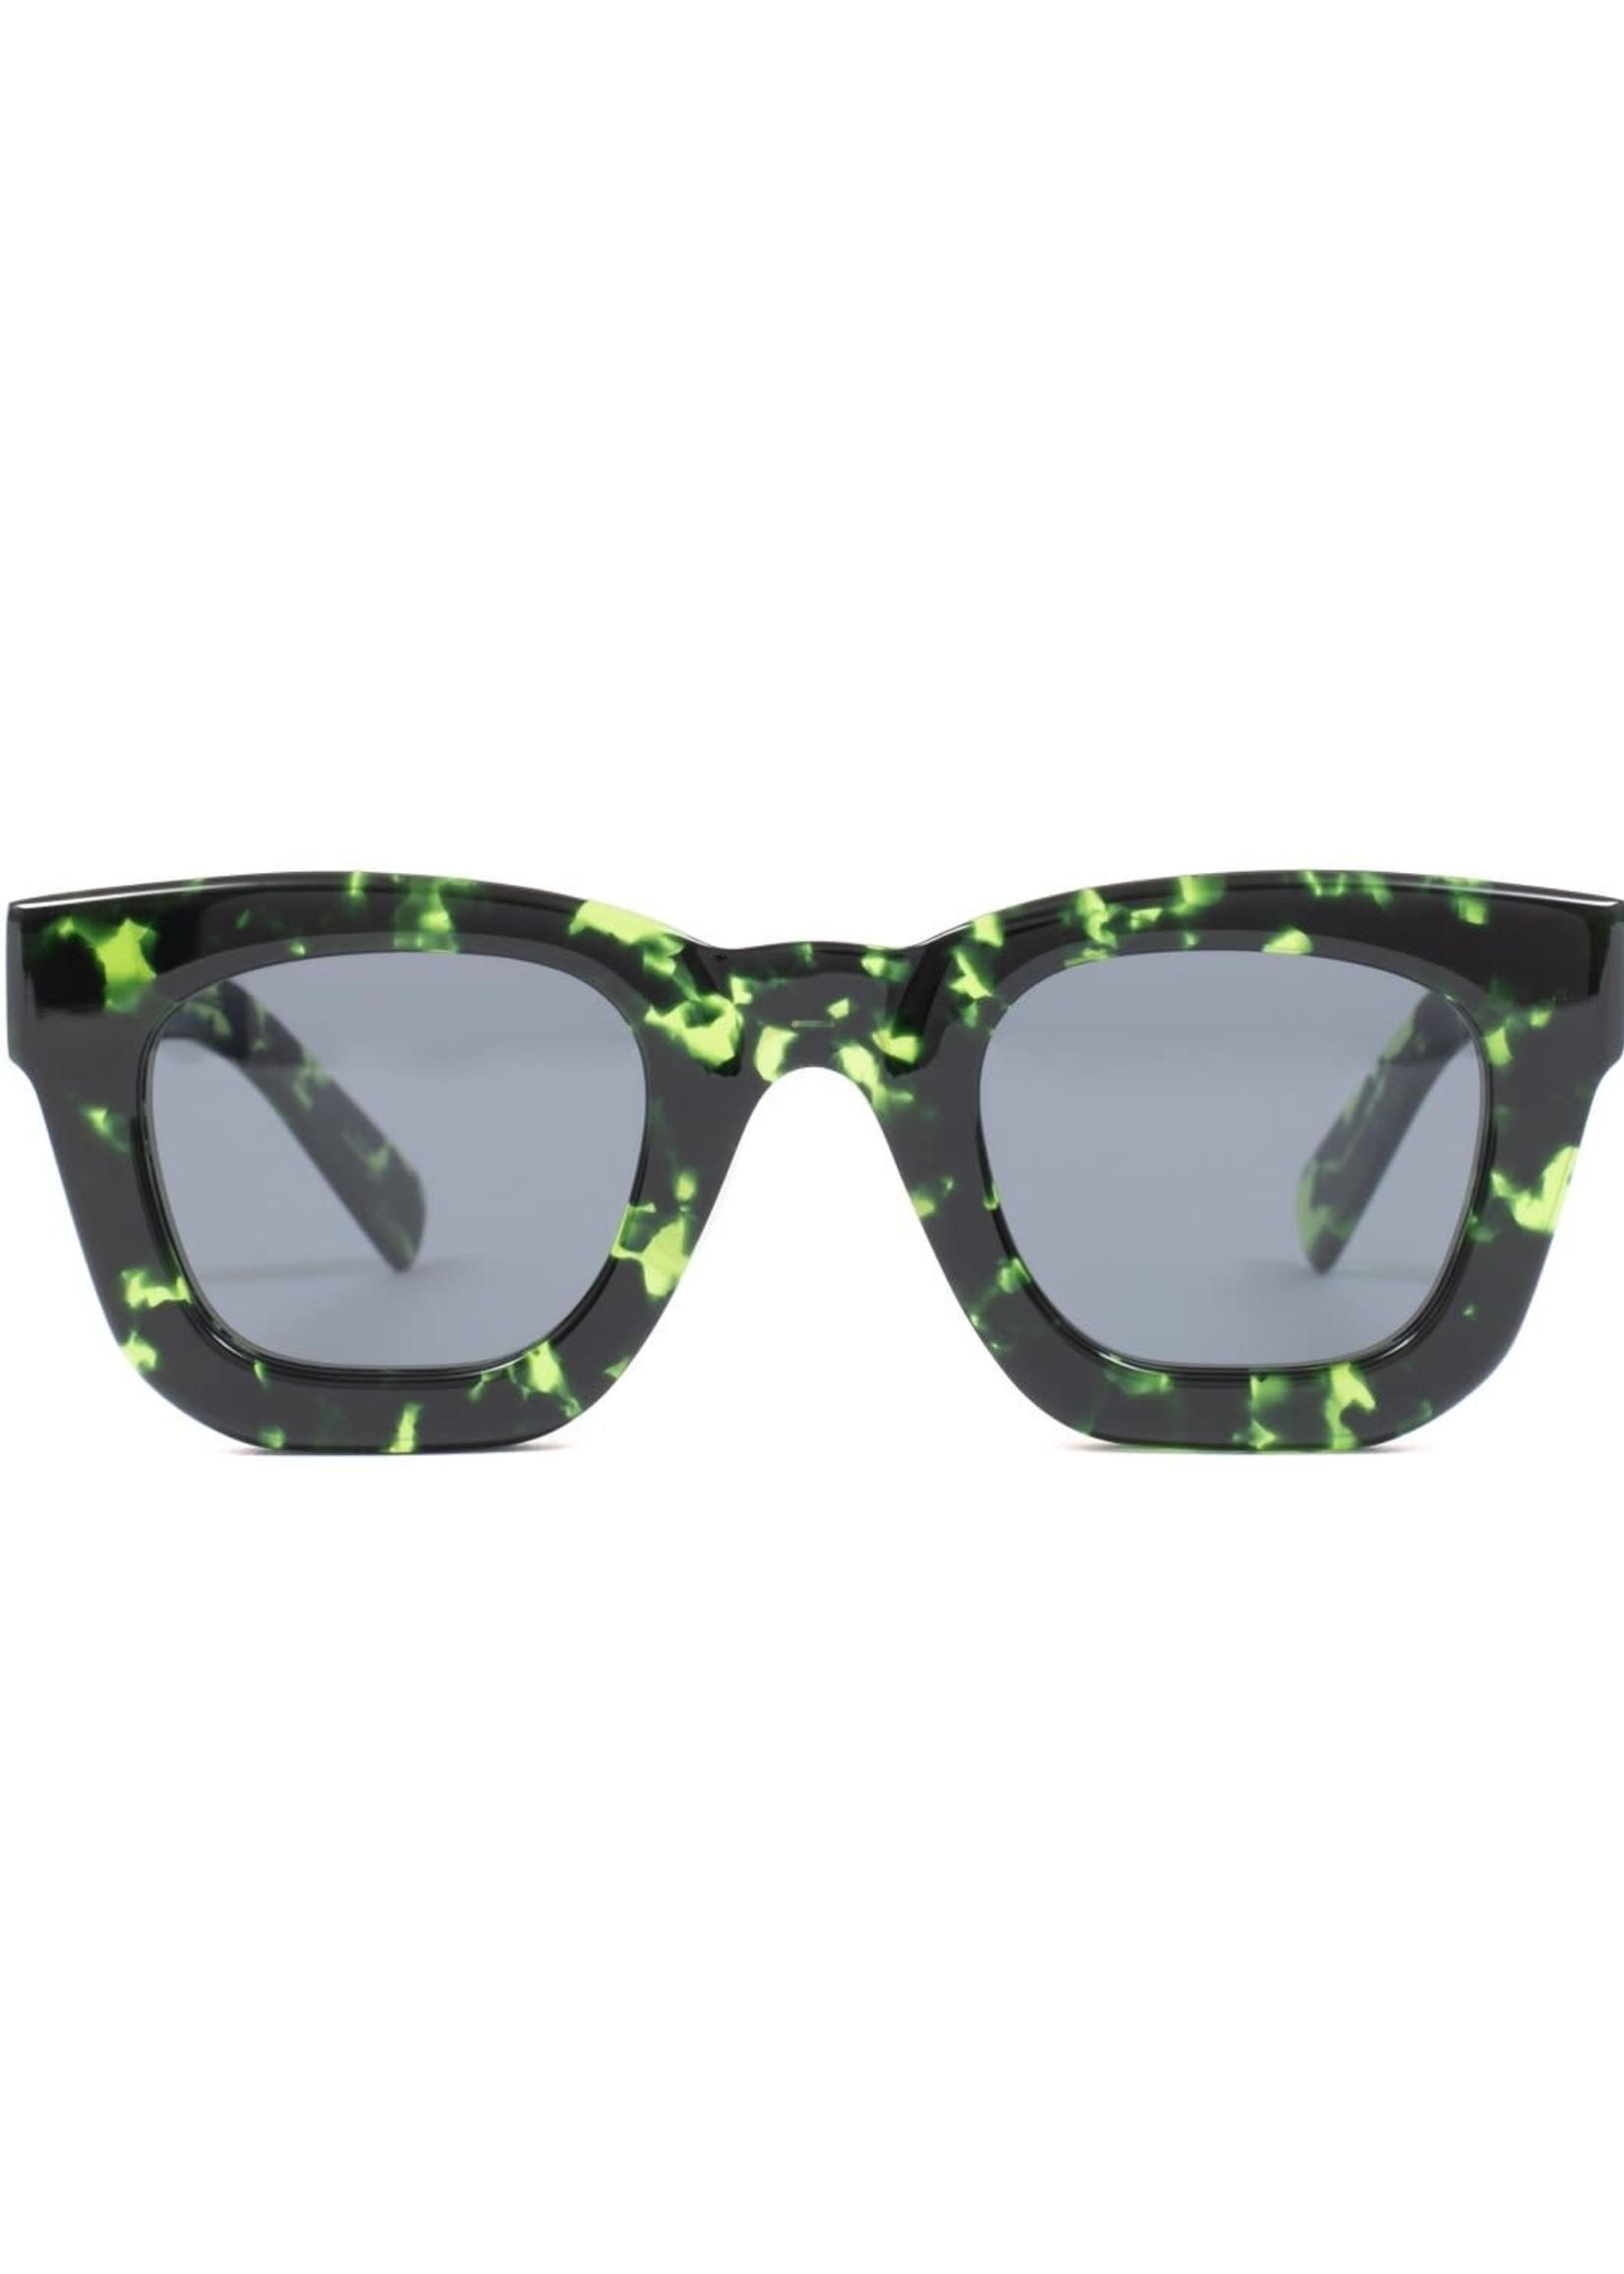 Brain Dead Elia Sunglasses in Green Tortoise / Black